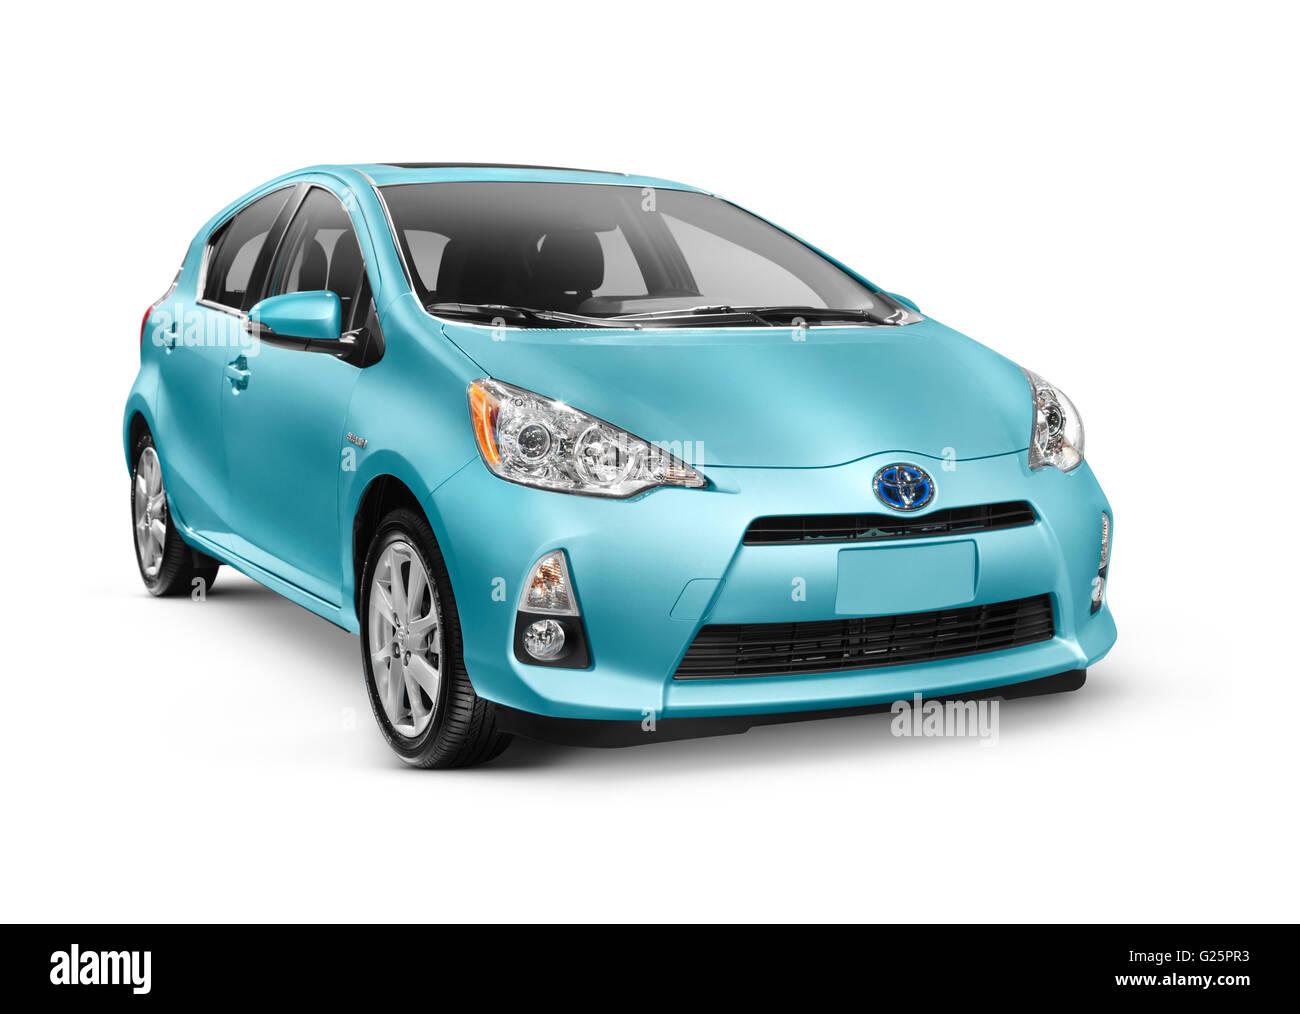 Blue 2013 Toyota Prius C mid-size hybrid car - Stock Image